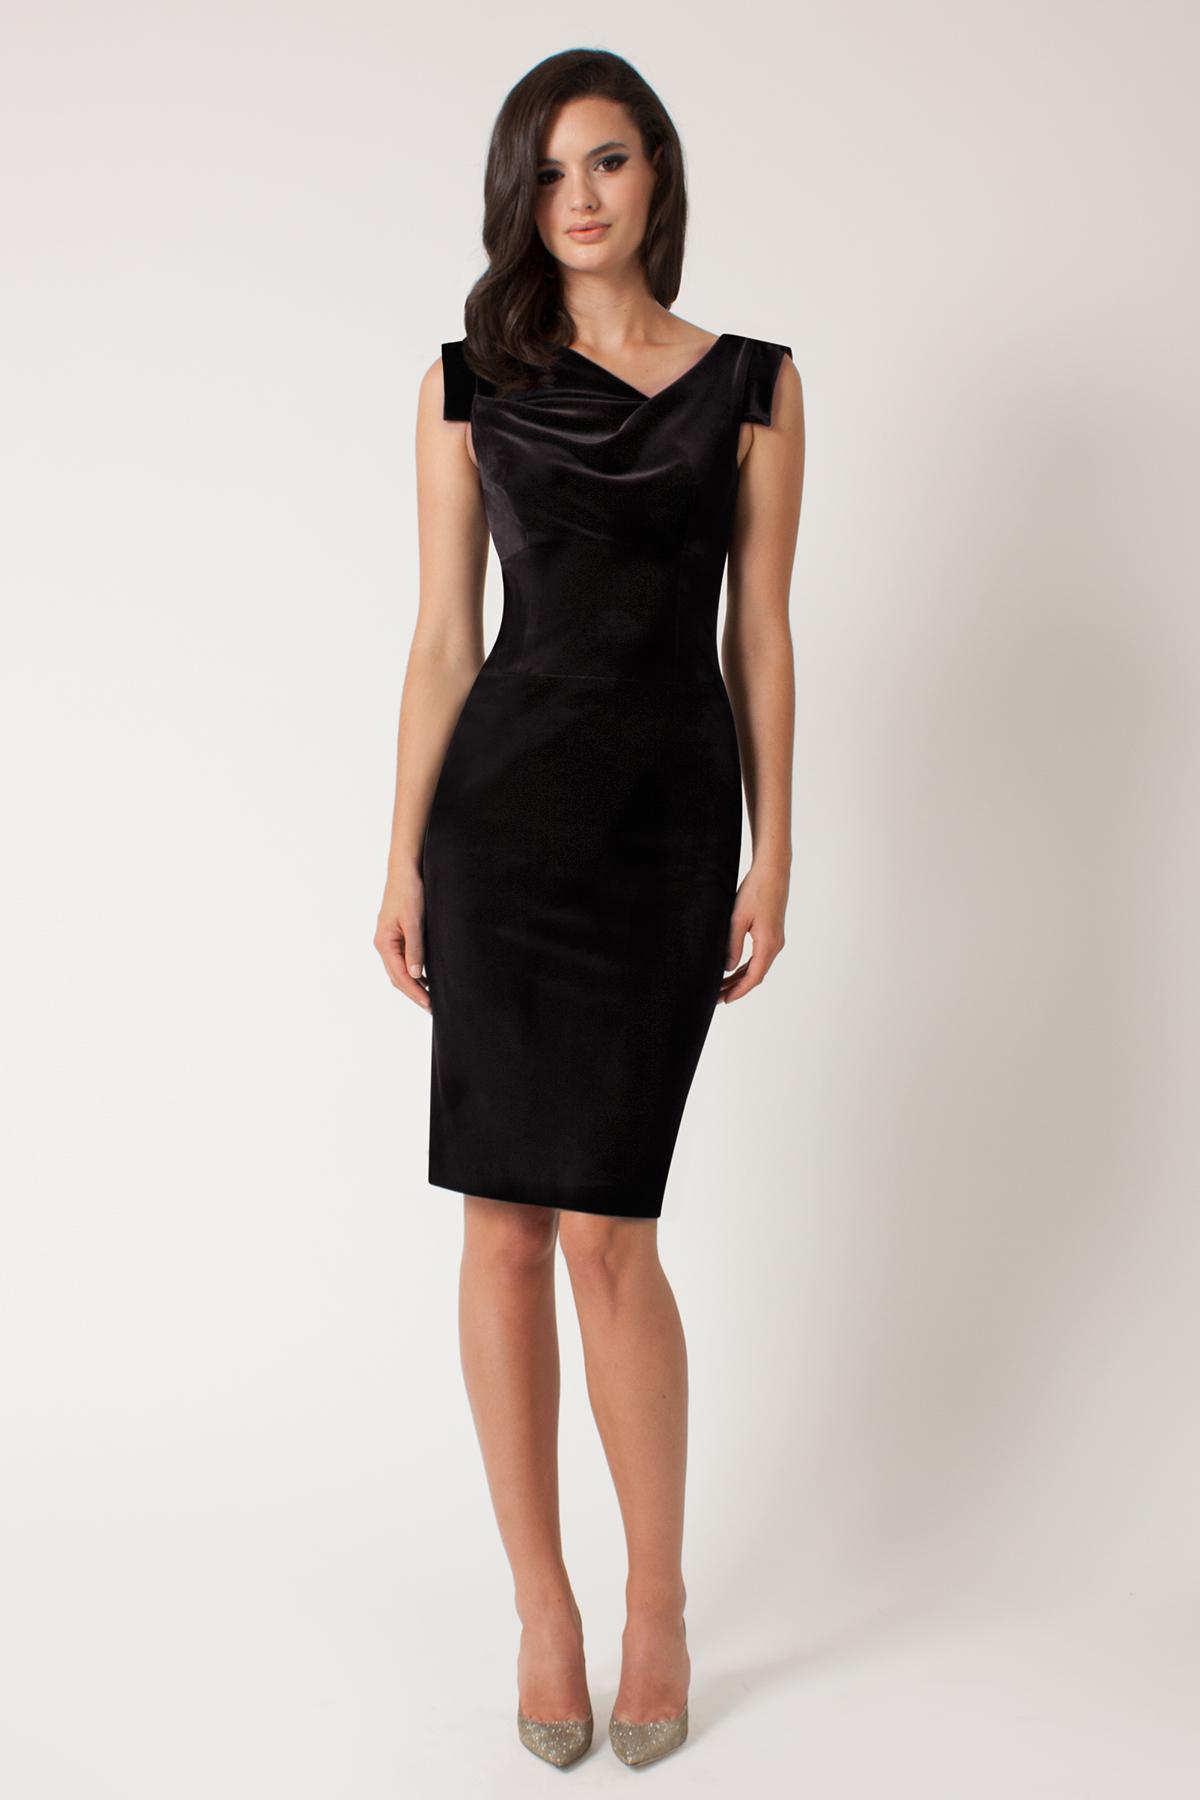 Black halo Velvet Jackie O Dress in Black | Lyst